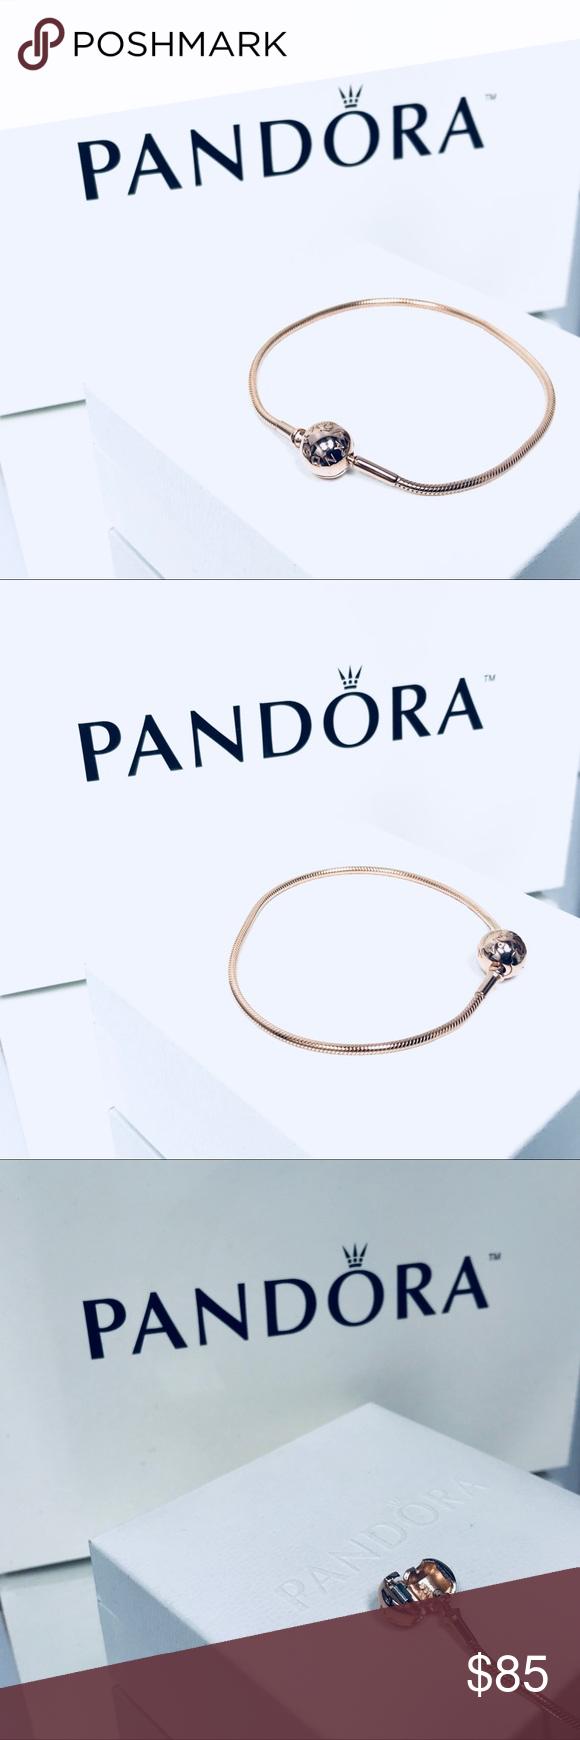 Authentic pandora rose gold essence bracelet new pandora rose gold